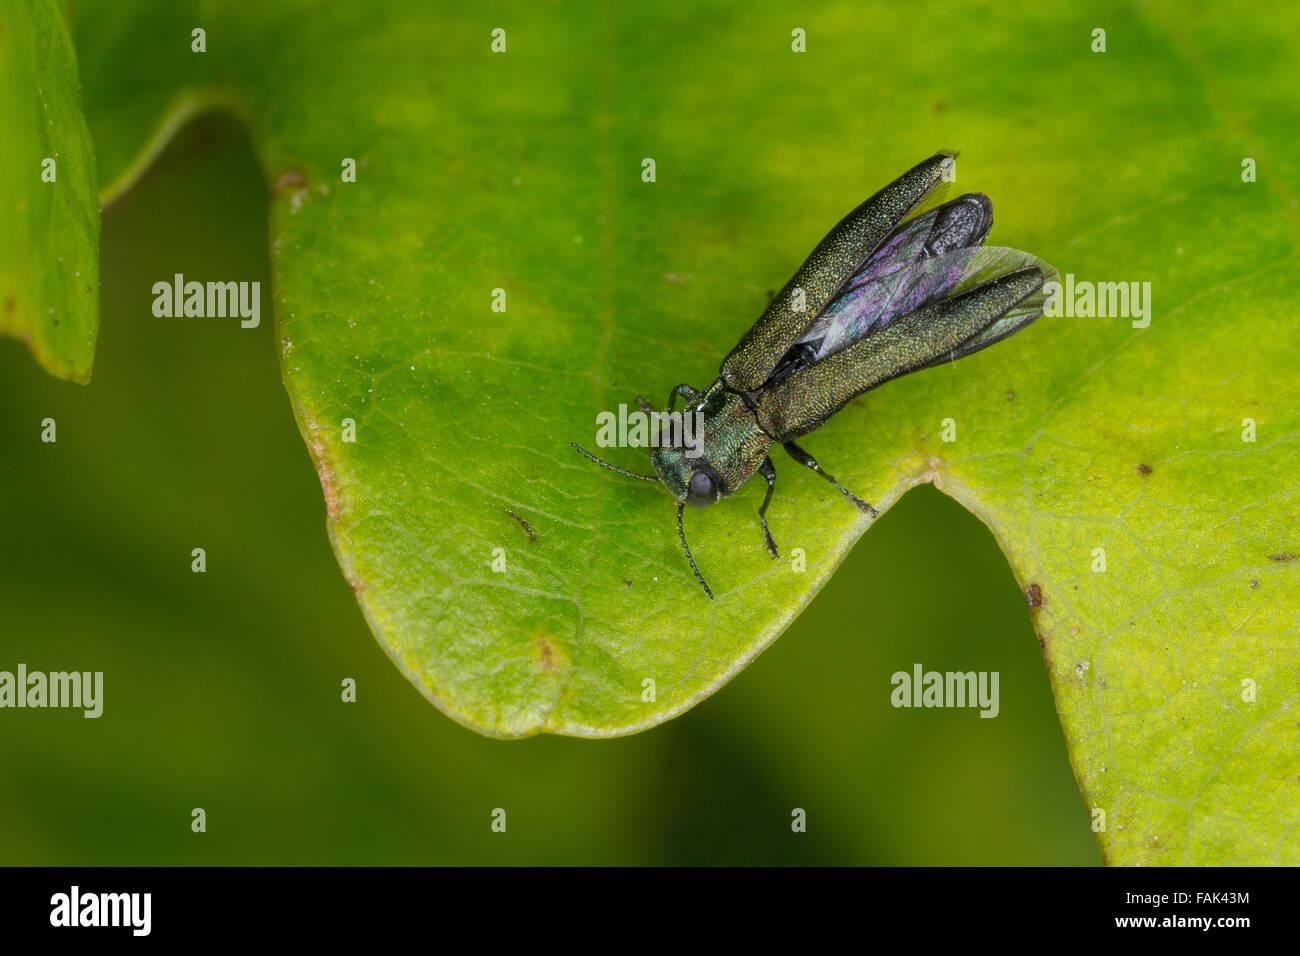 Jewel beetle, Buprestid, Prachtkäfer an Eiche, Agrilus spec. - Stock Image